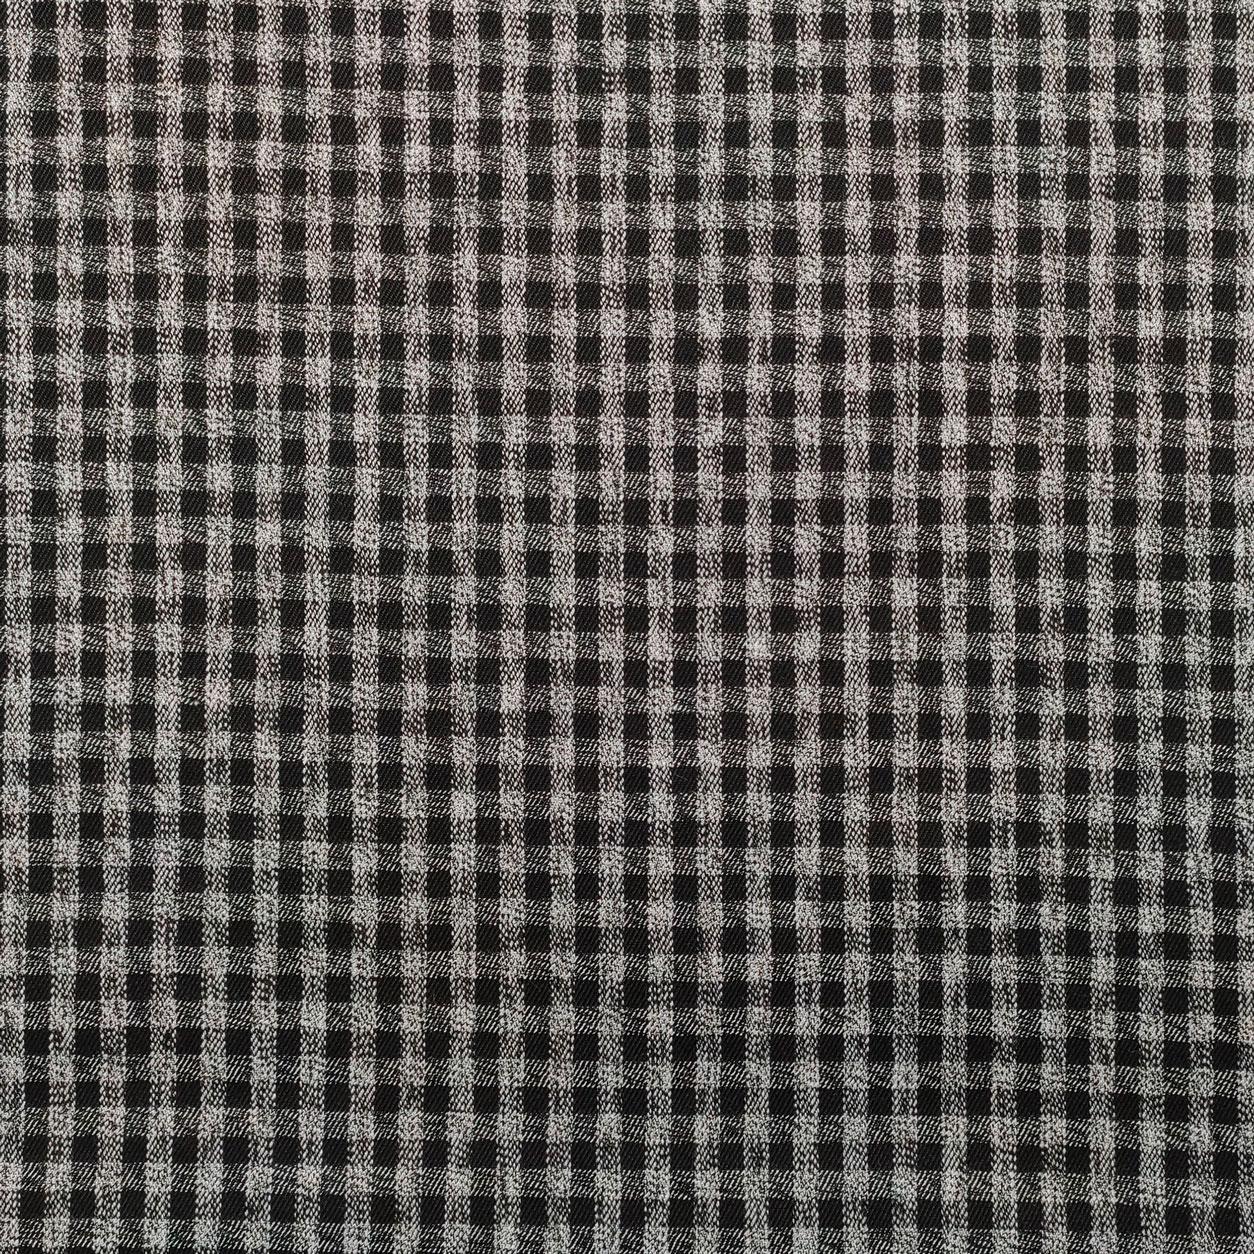 Tessuto Quadretto Bianco e Nero